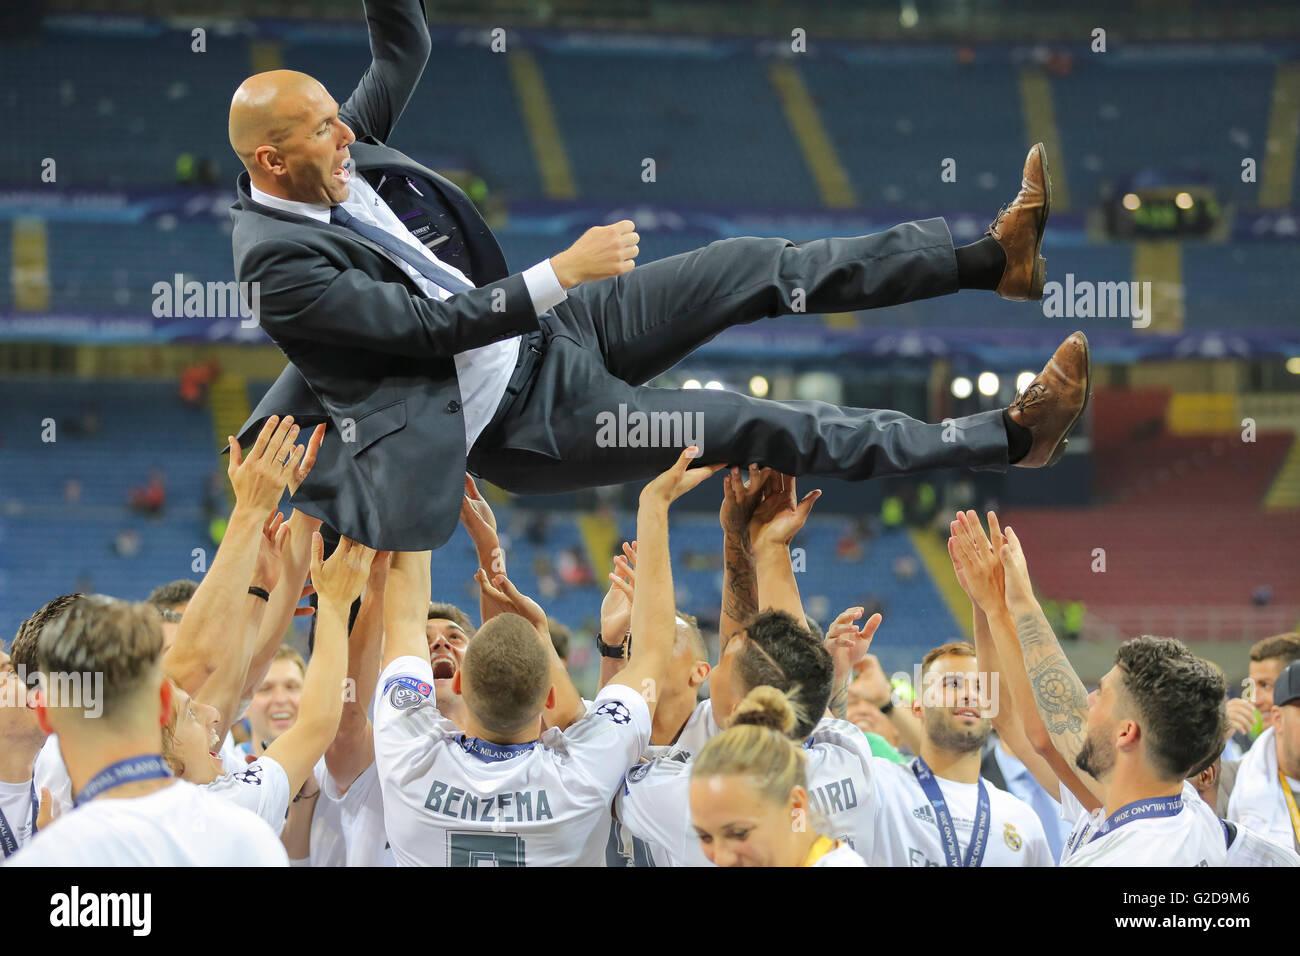 Mailand, Italien. 28. Mai 2016. Zinedine ZIDANE, Real Madrid Trainer sein Team Champions League Trophy Zeremonie, Stockbild